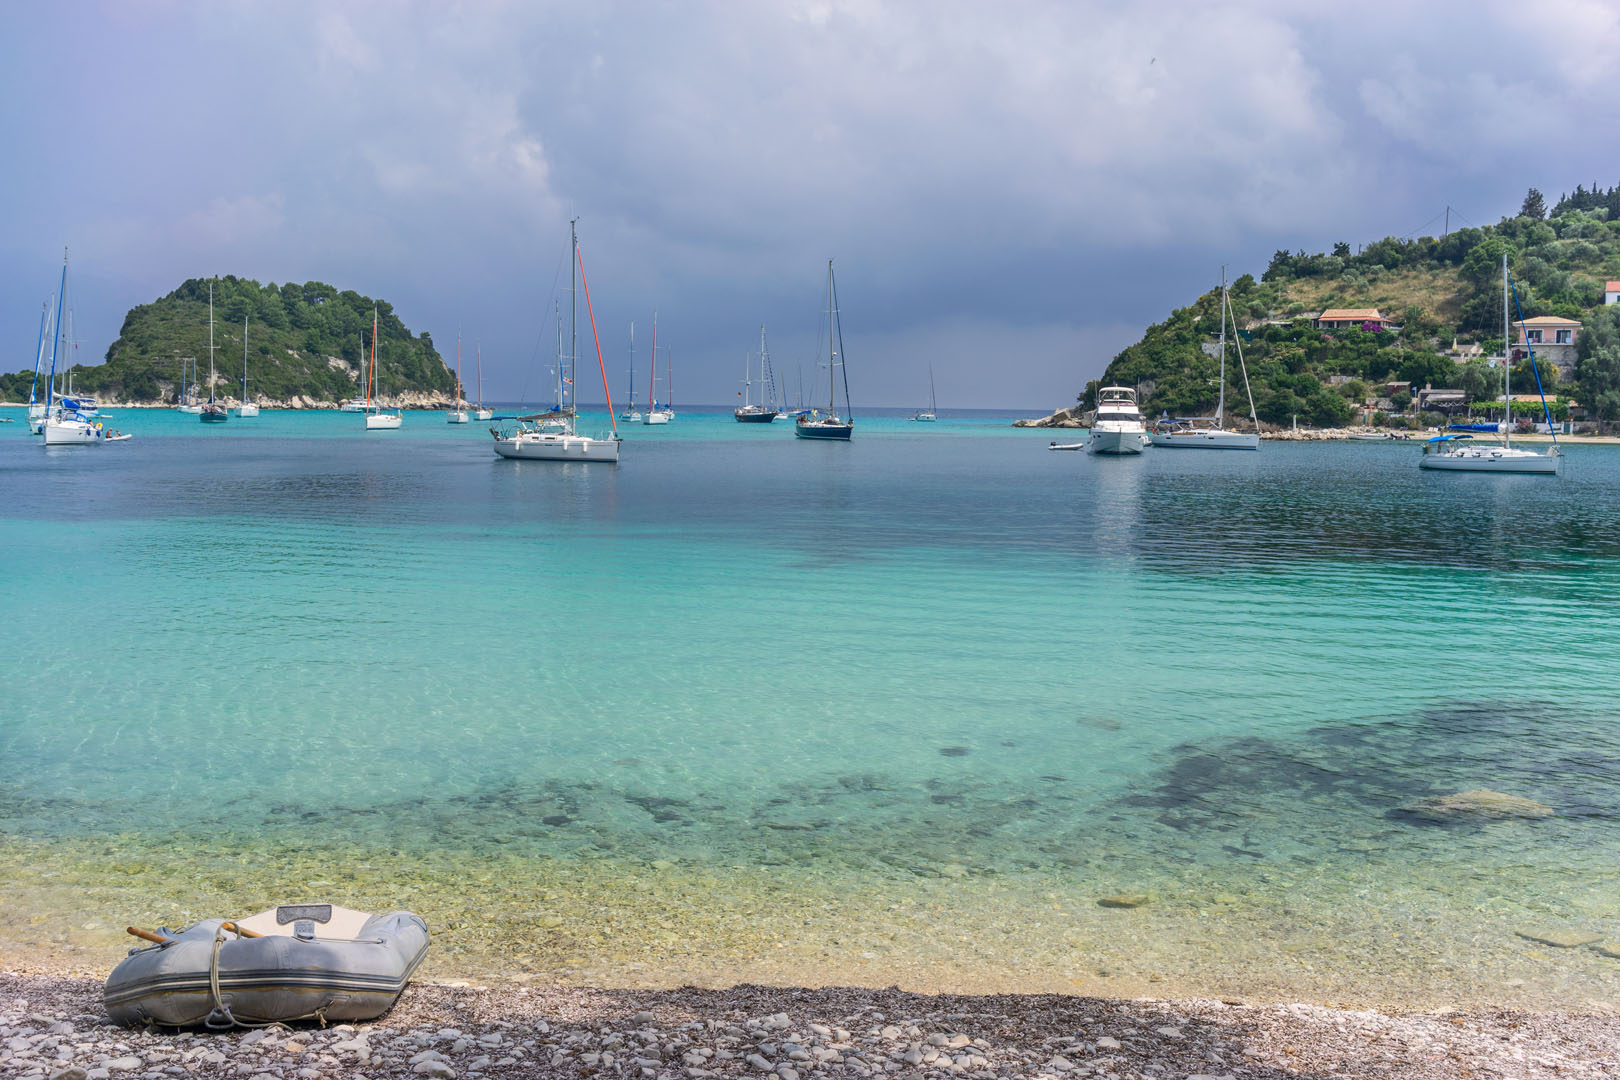 Kanoni-walking-path-with-Ionian-Cruises